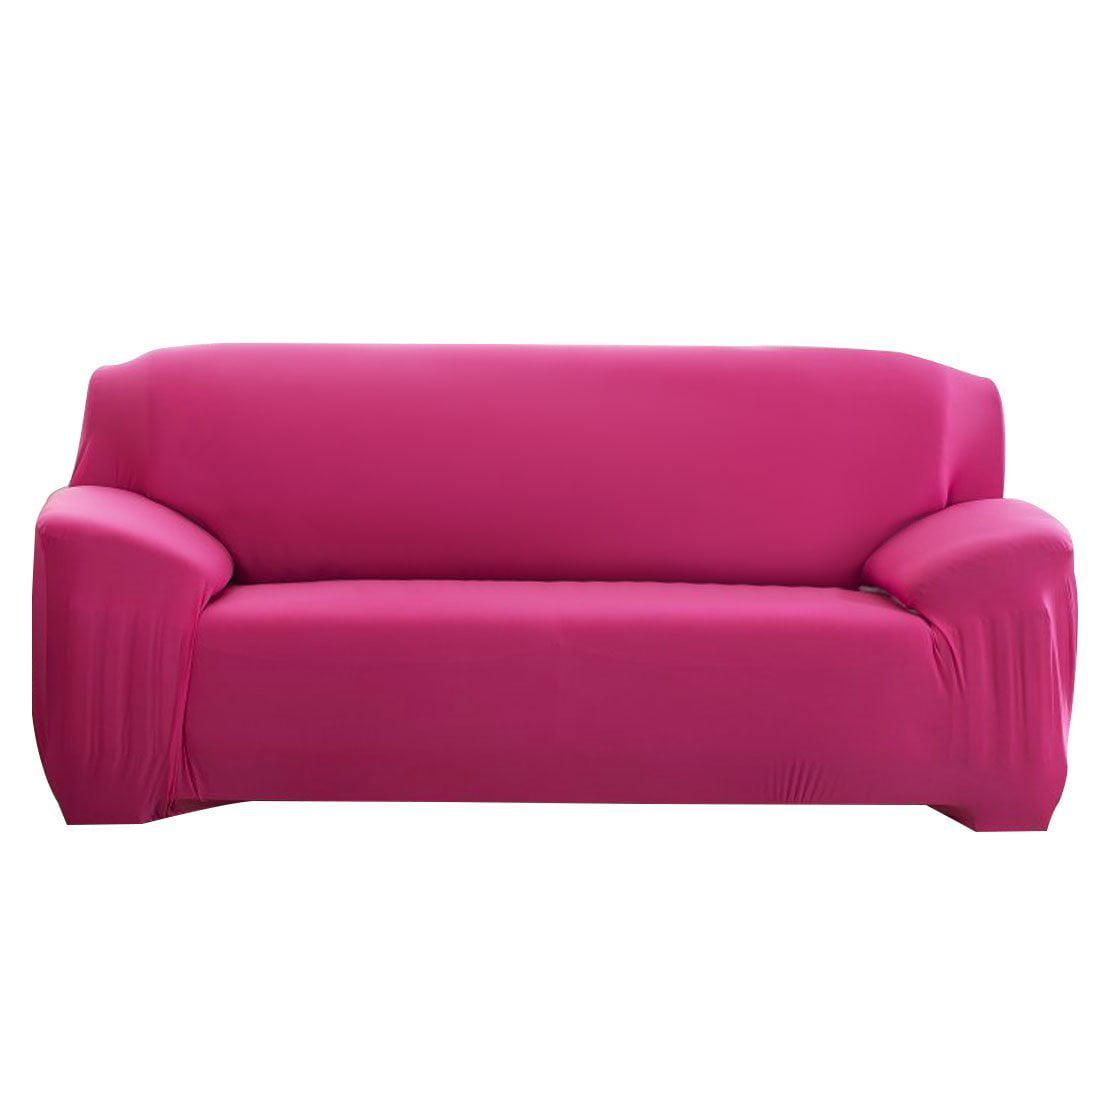 Stretch Sofa Slipcover, Elastic Sofa Cover Couch Pure Color Anti ...